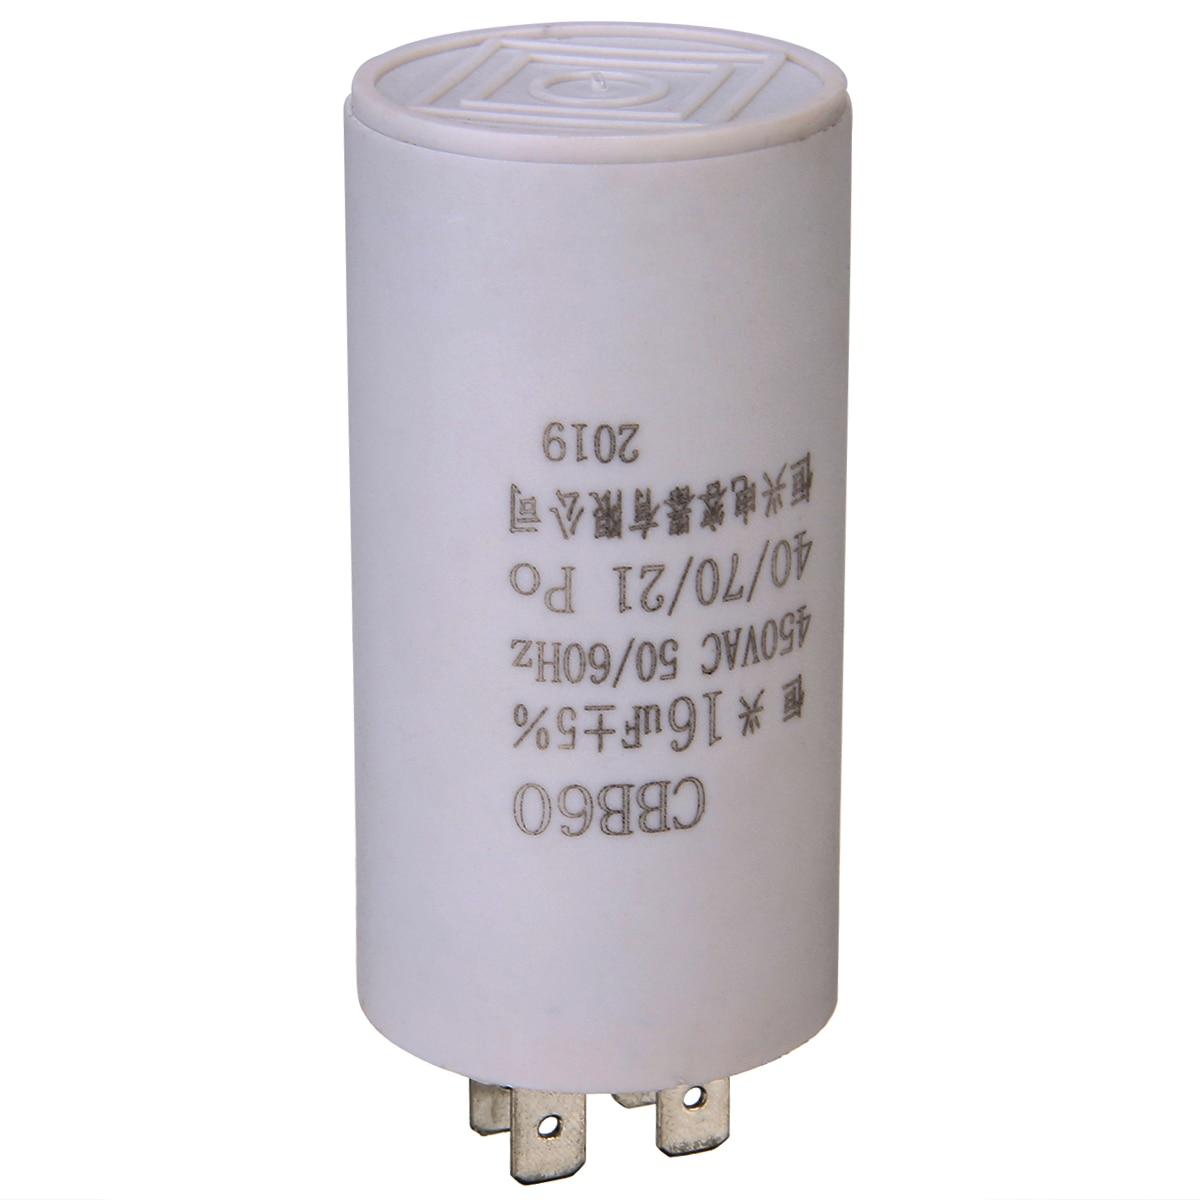 1Pc Washing Machine CBB60 16uF AC450V 5/% Non Polar Motor Capacitor DT